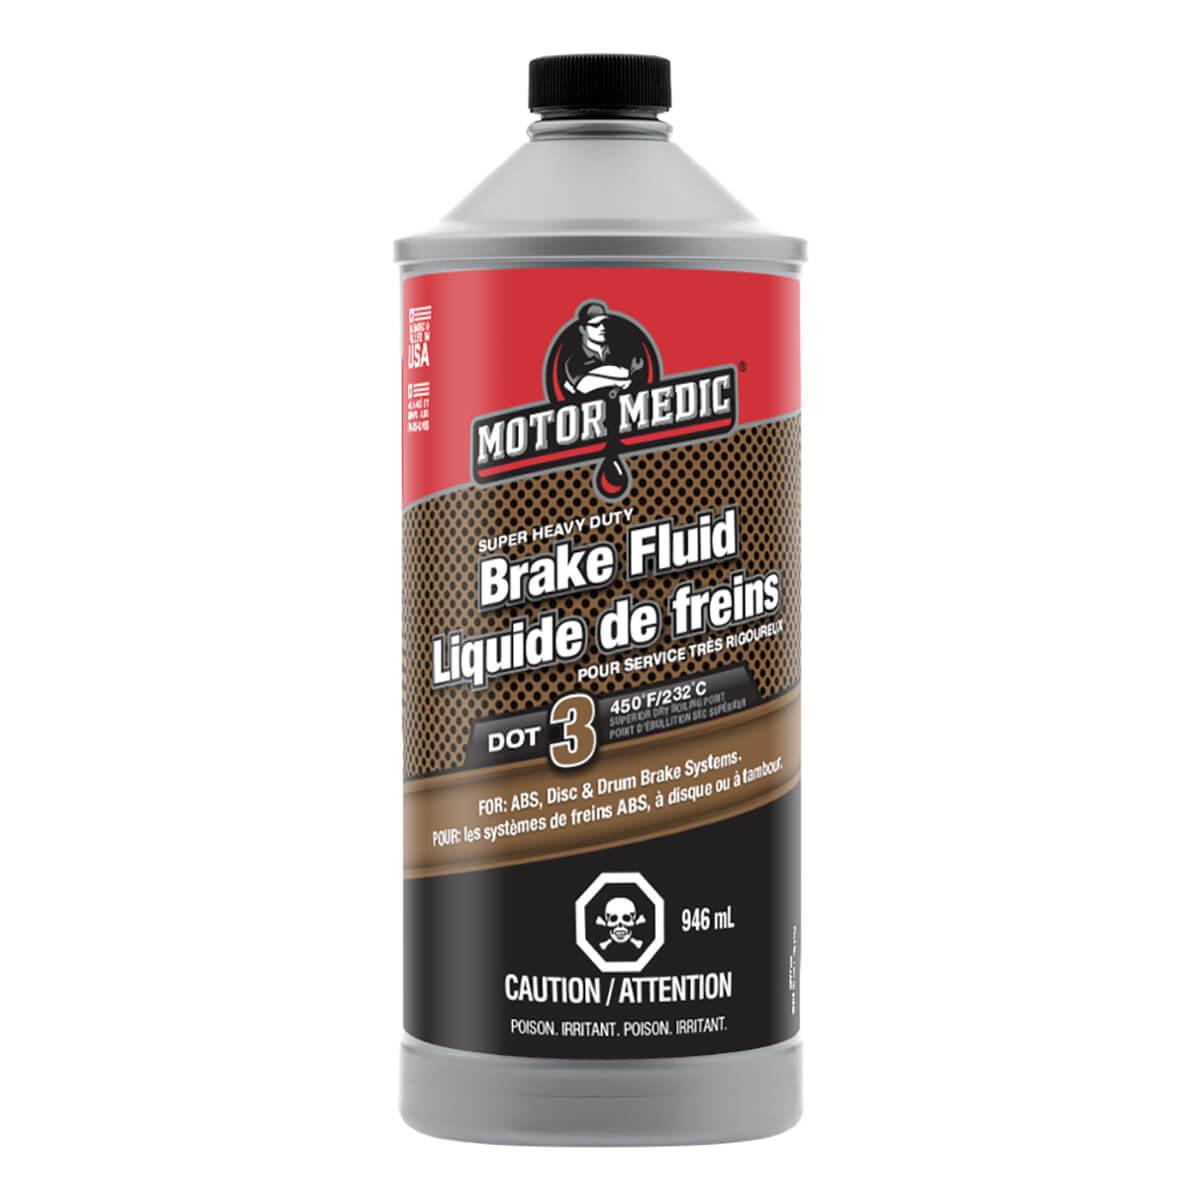 Motor Medic Synthetic Brake Fluid - 946 ml